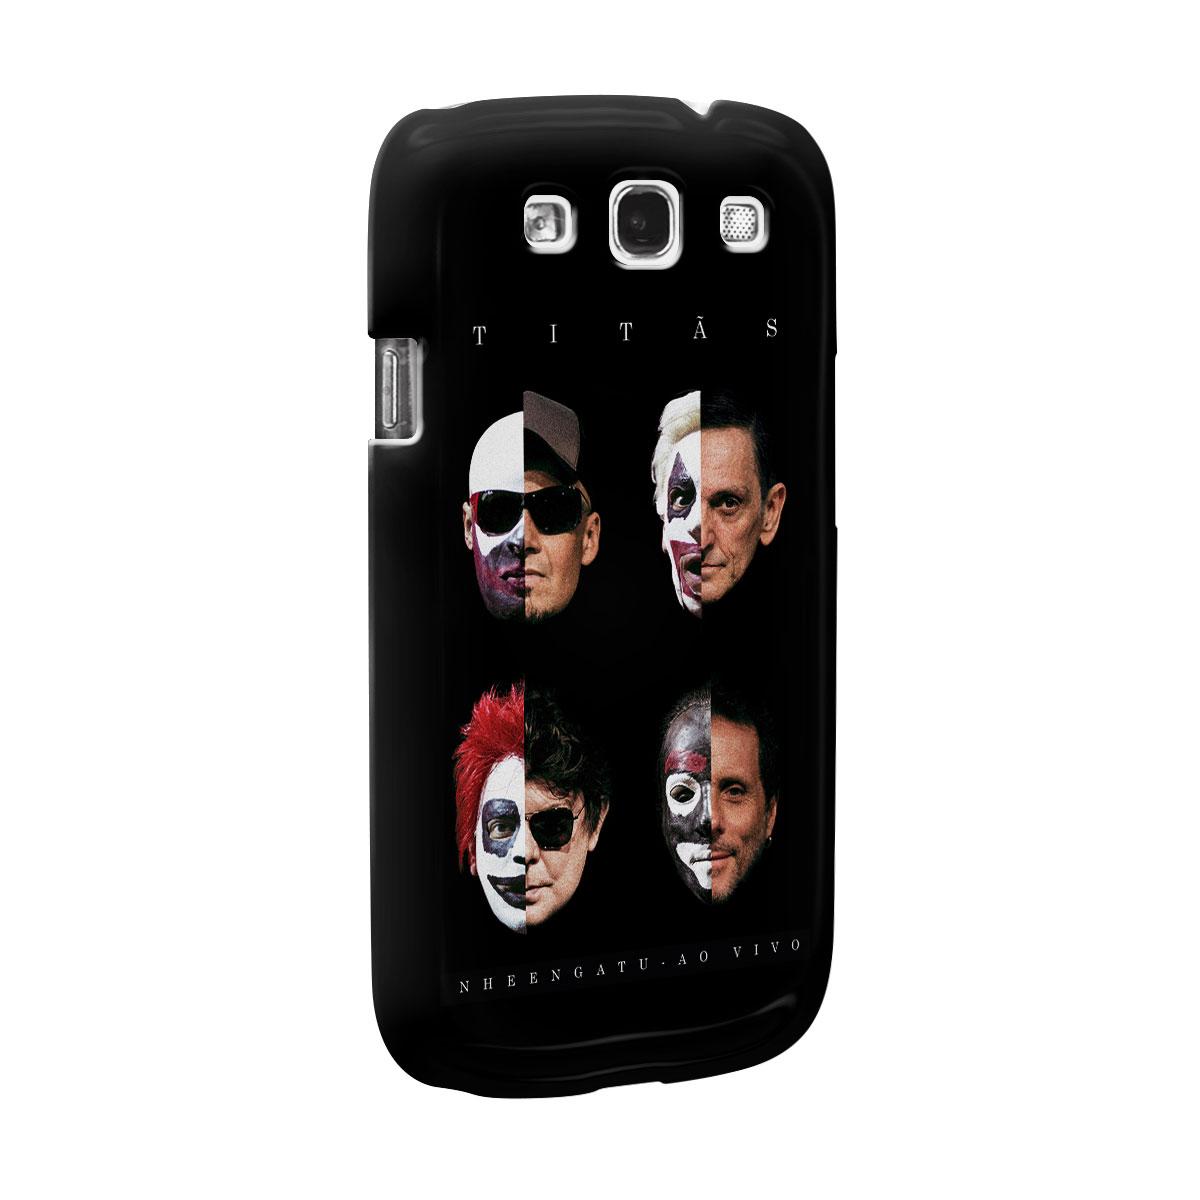 Capa para Samsung Galaxy S3 Titãs Capa Nheengatu Ao Vivo